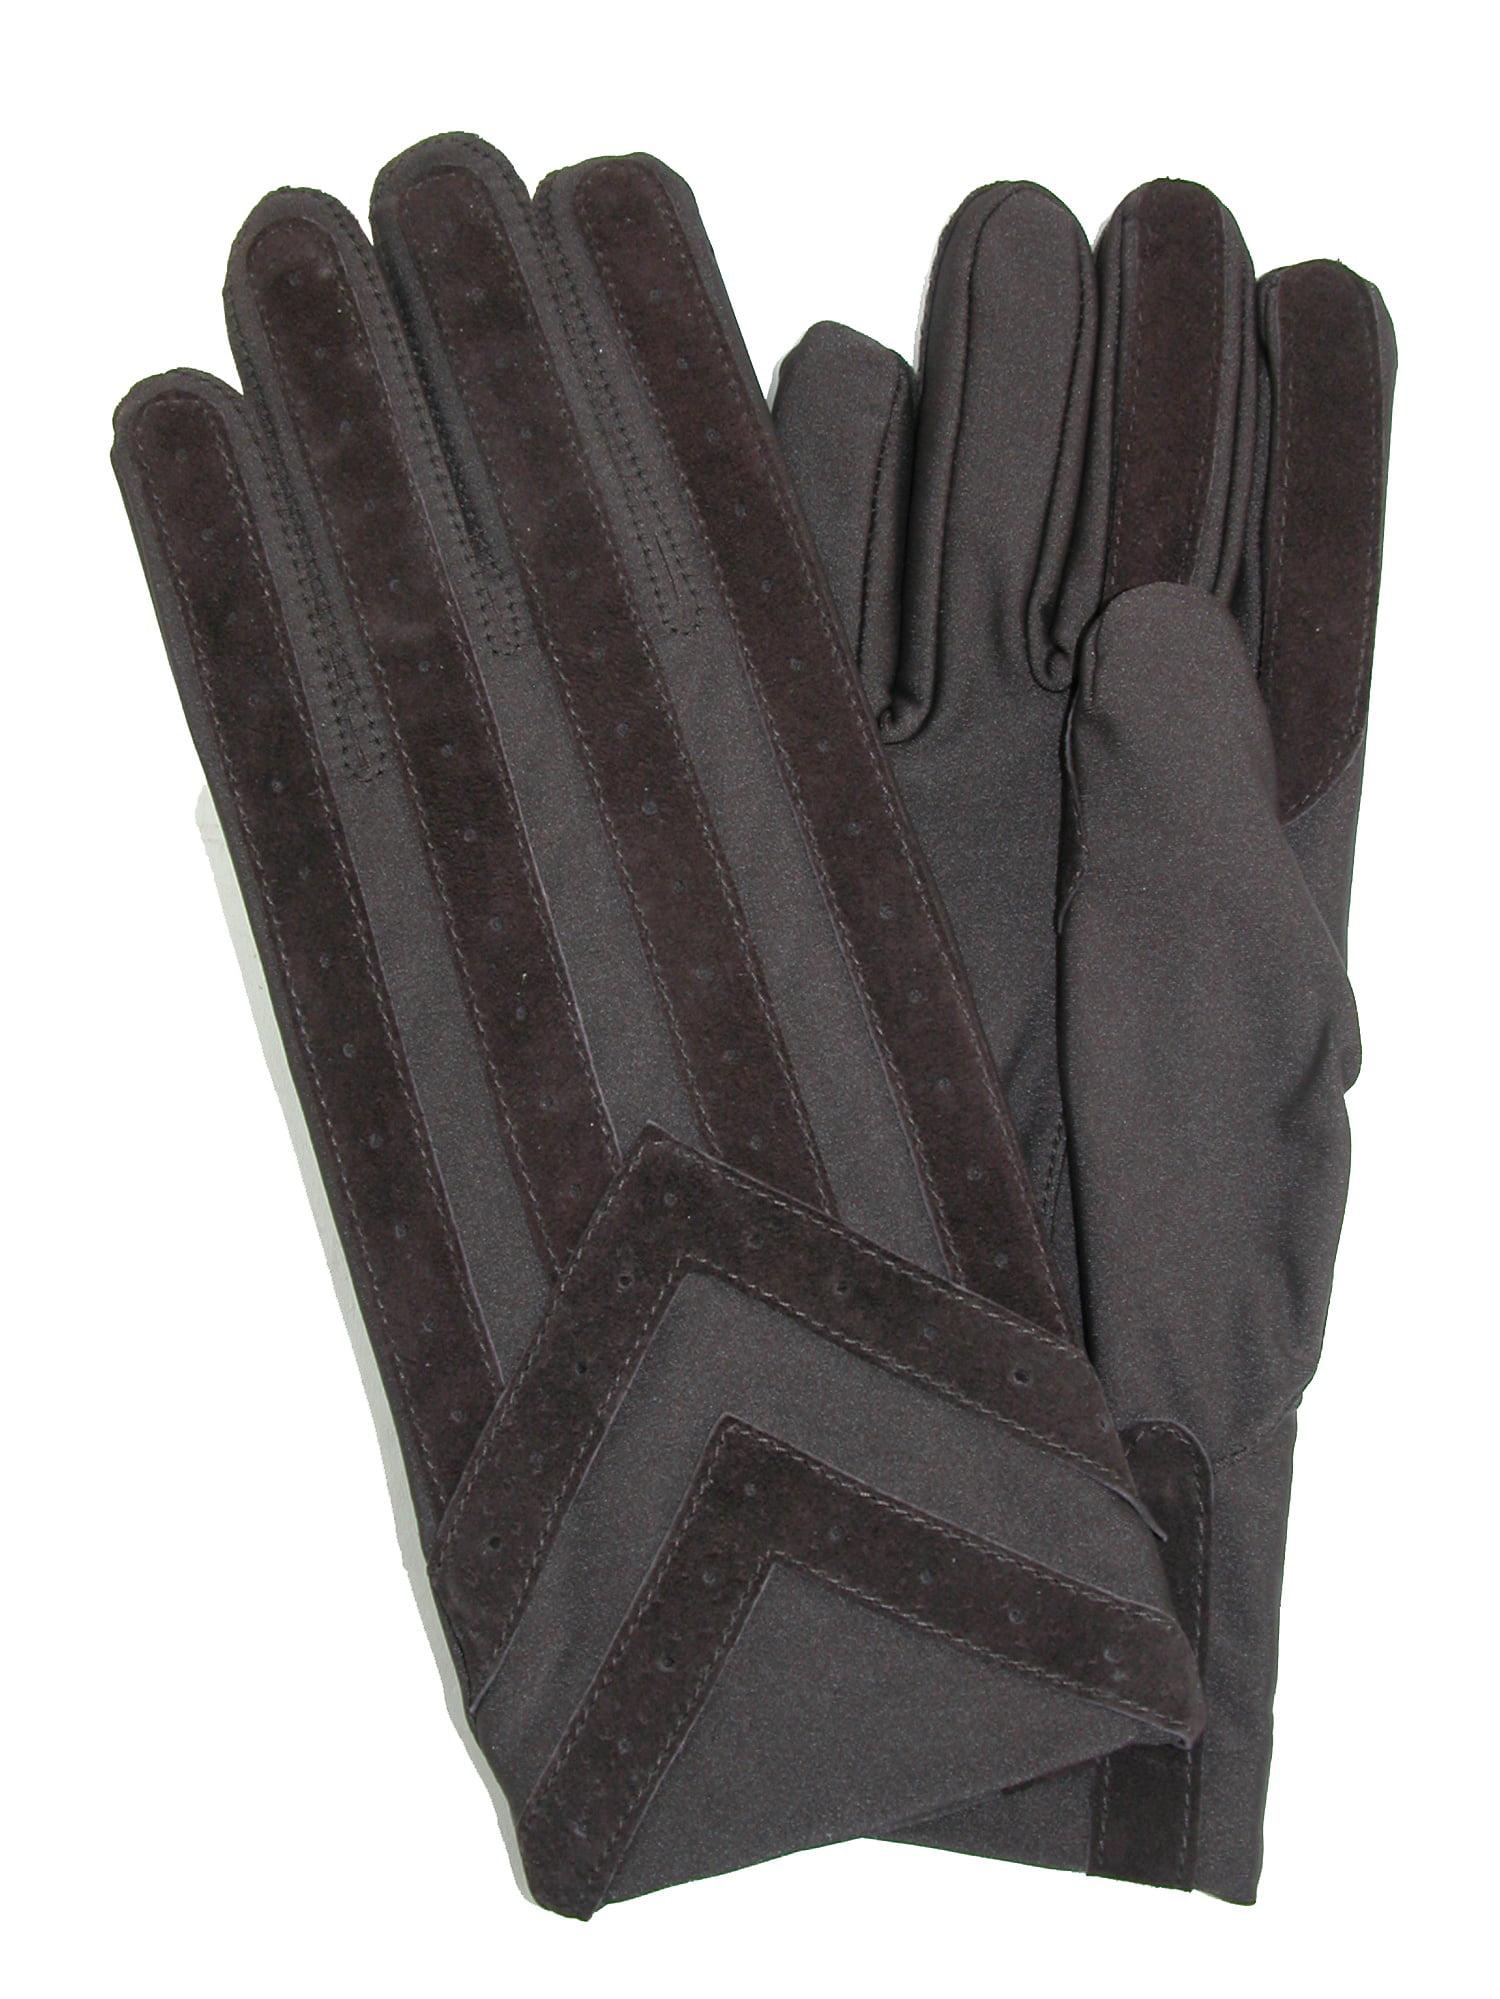 Isotoner Women/'s Gloves Size M L Black Smartouch Plush Retail $42